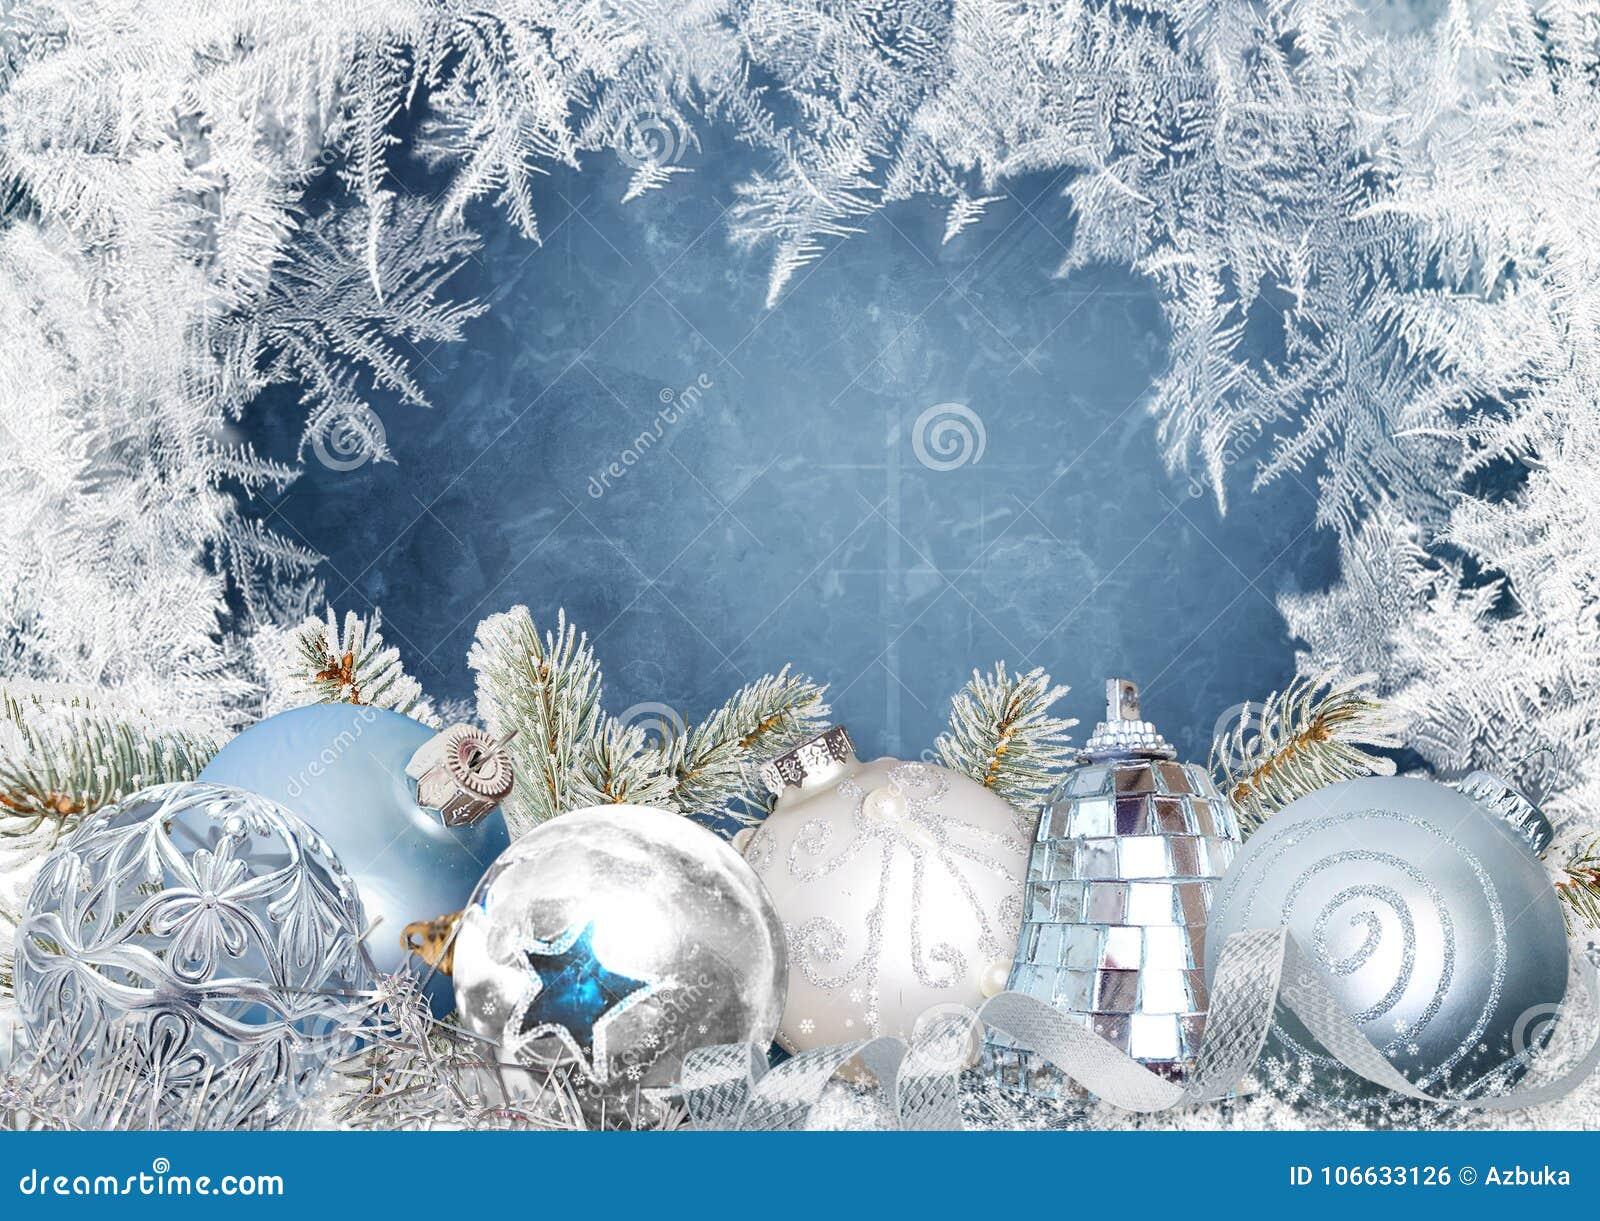 Immagini Belle Per Auguri Di Natale.Cartolina D Auguri Di Natale Con Le Belle Palle Su Un Fondo